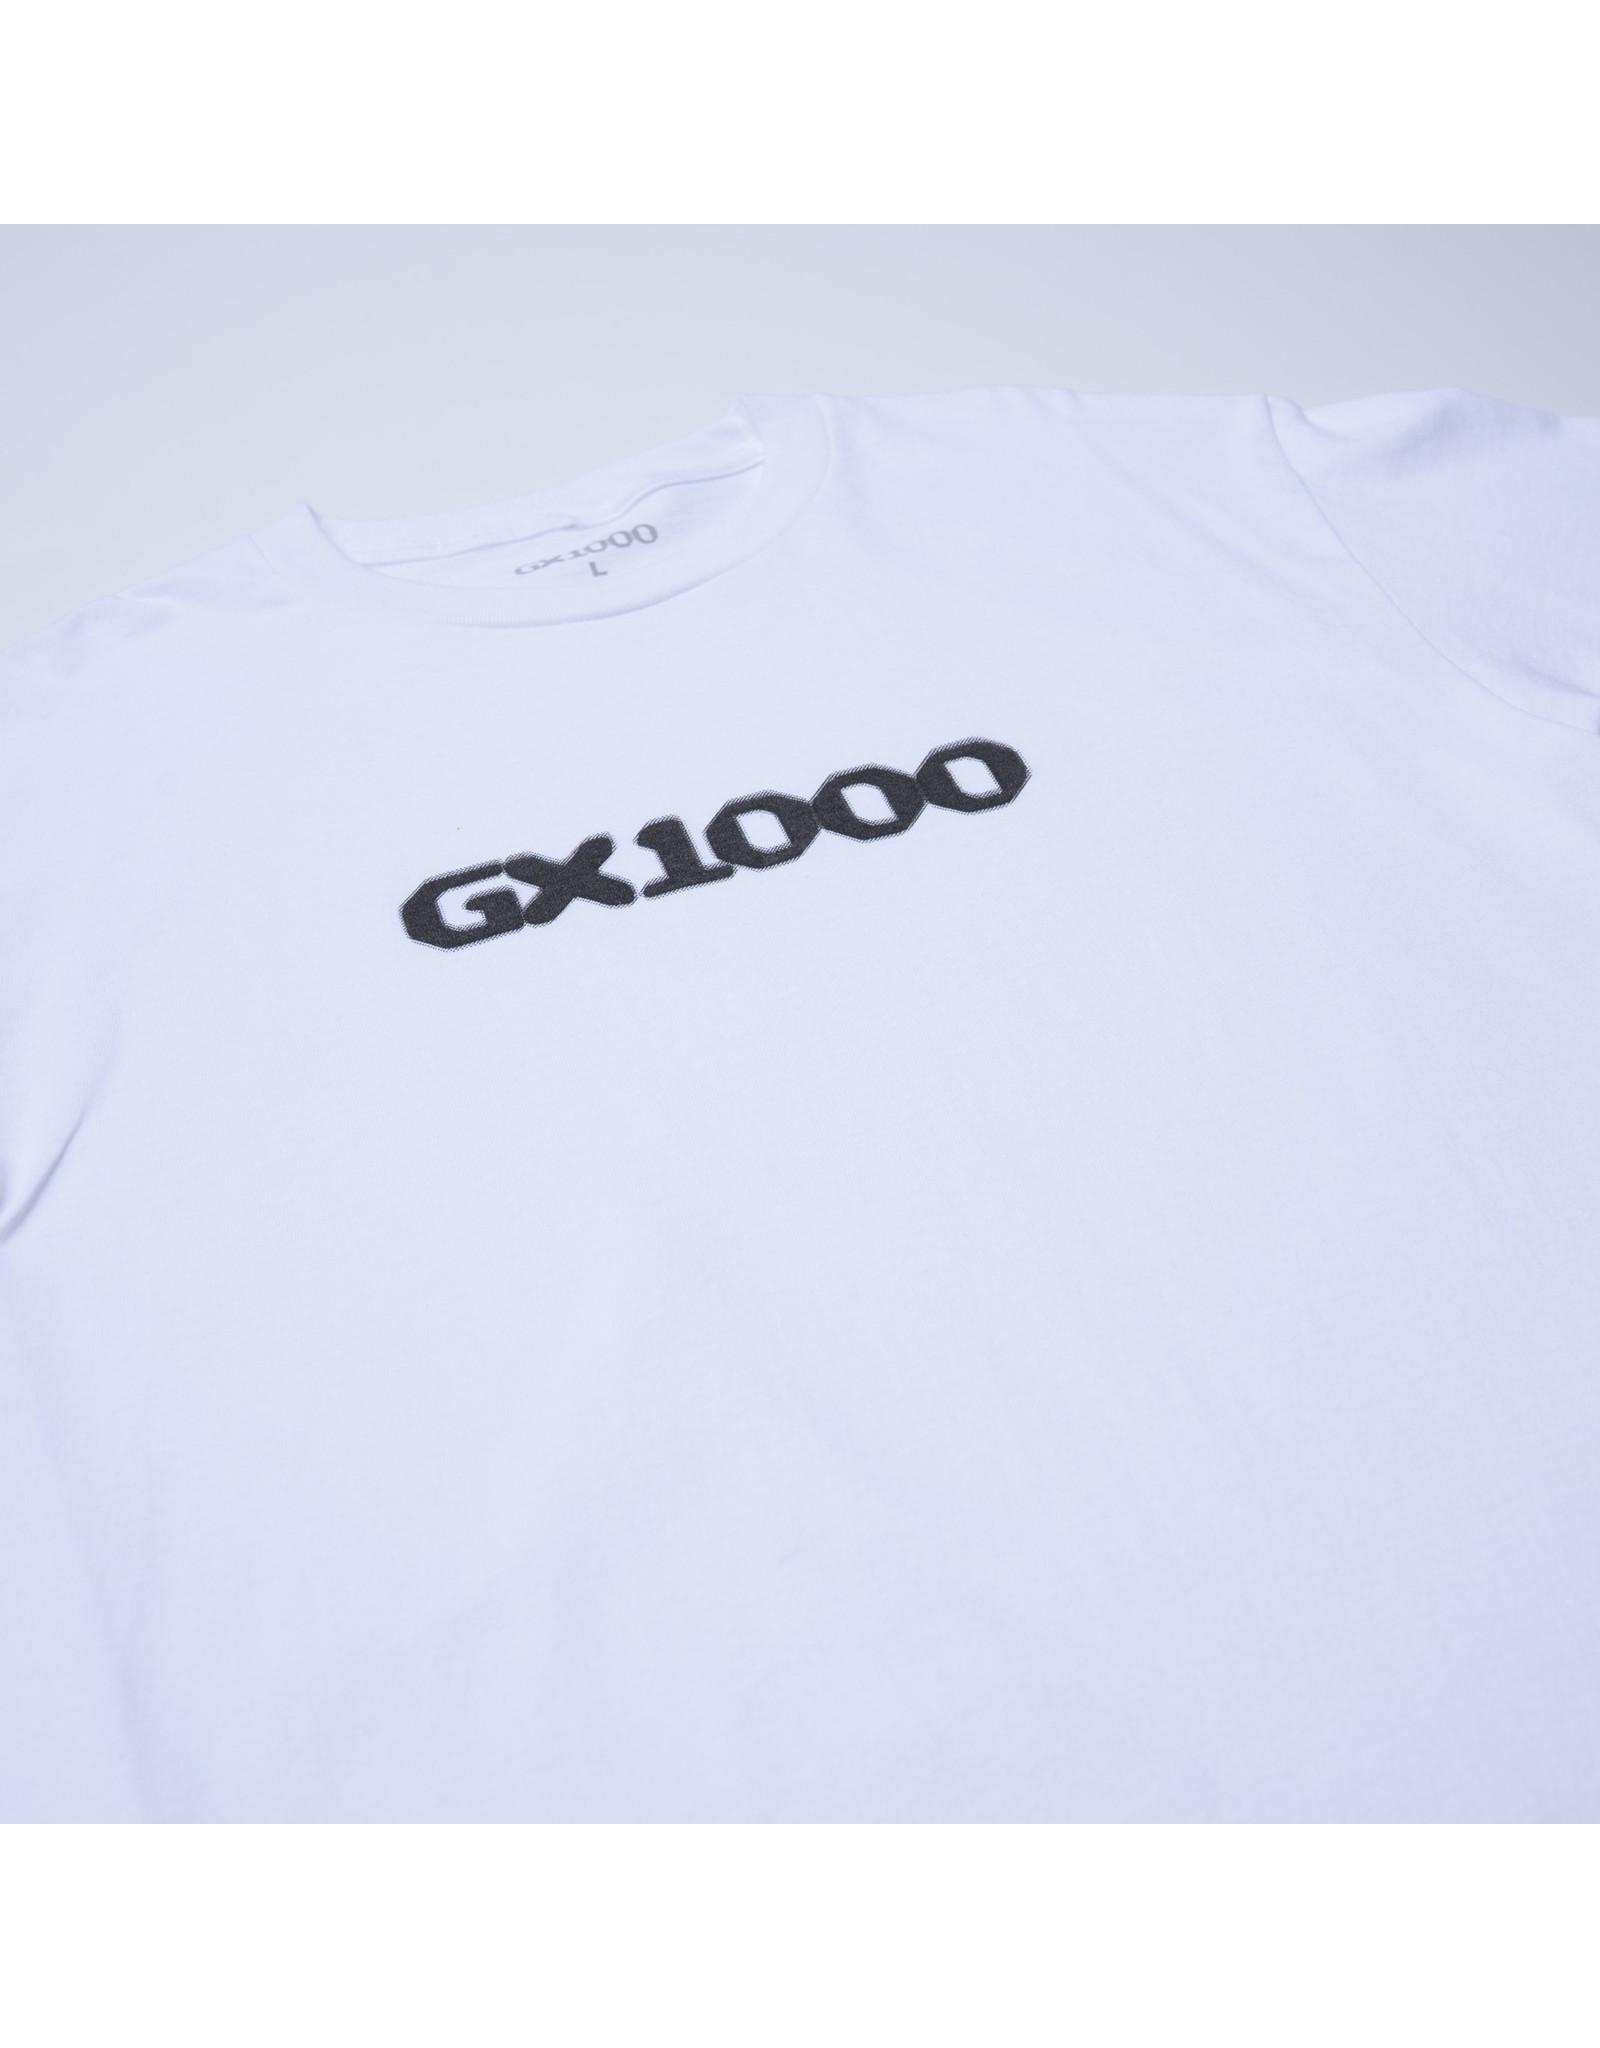 GX1000 Dithered Logo - White